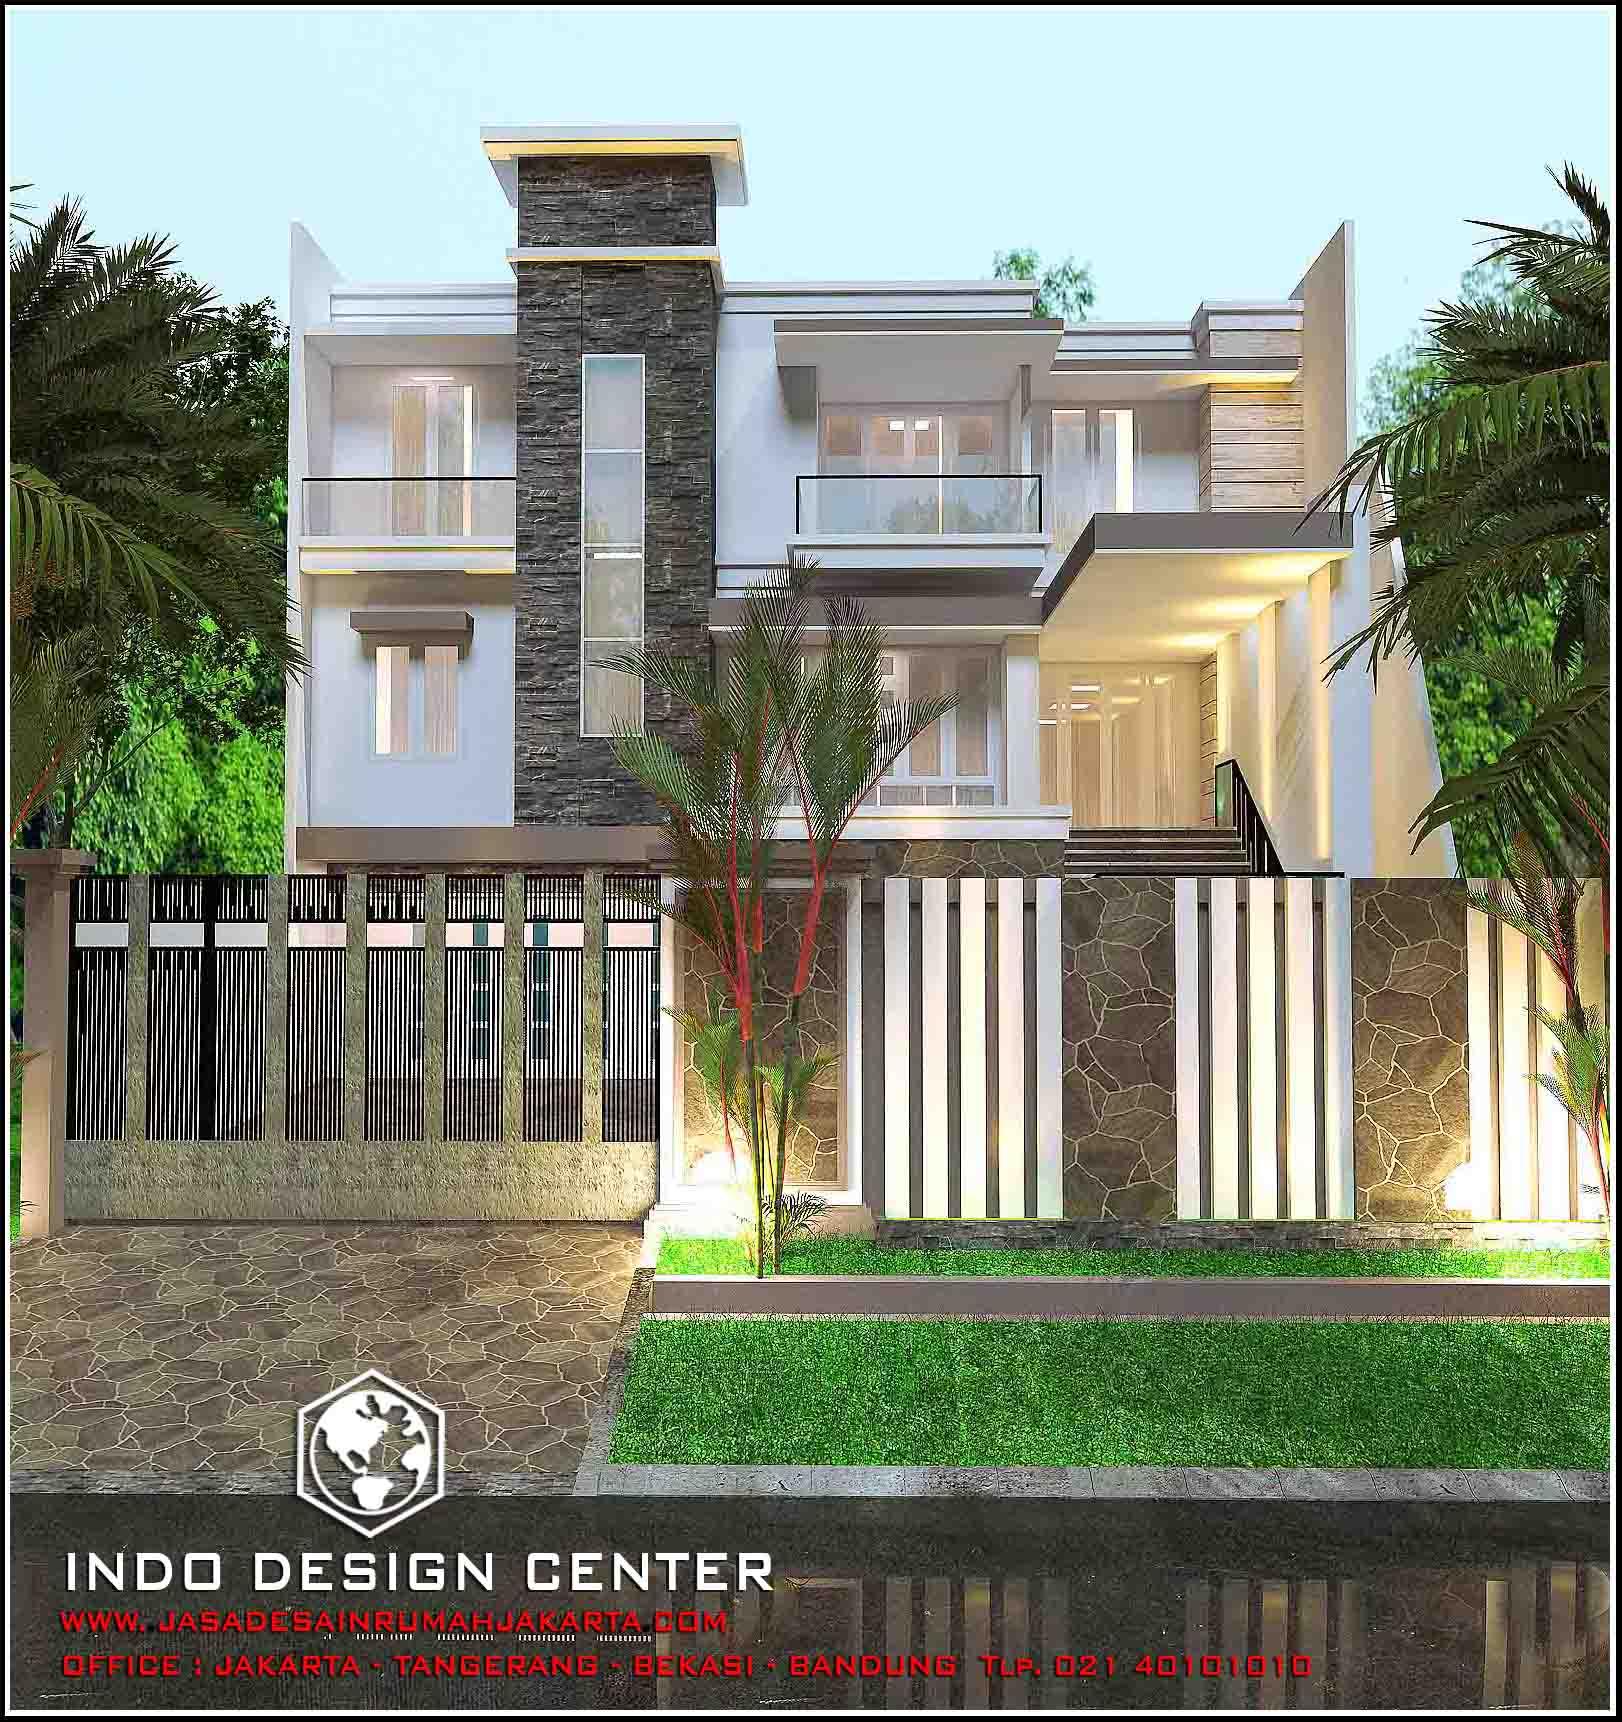 Interior kantor minimalis tropis 3 lantai - Model Rumah Minimalis 3 Lantai Tampak Minimalis 2 Lantai View 002